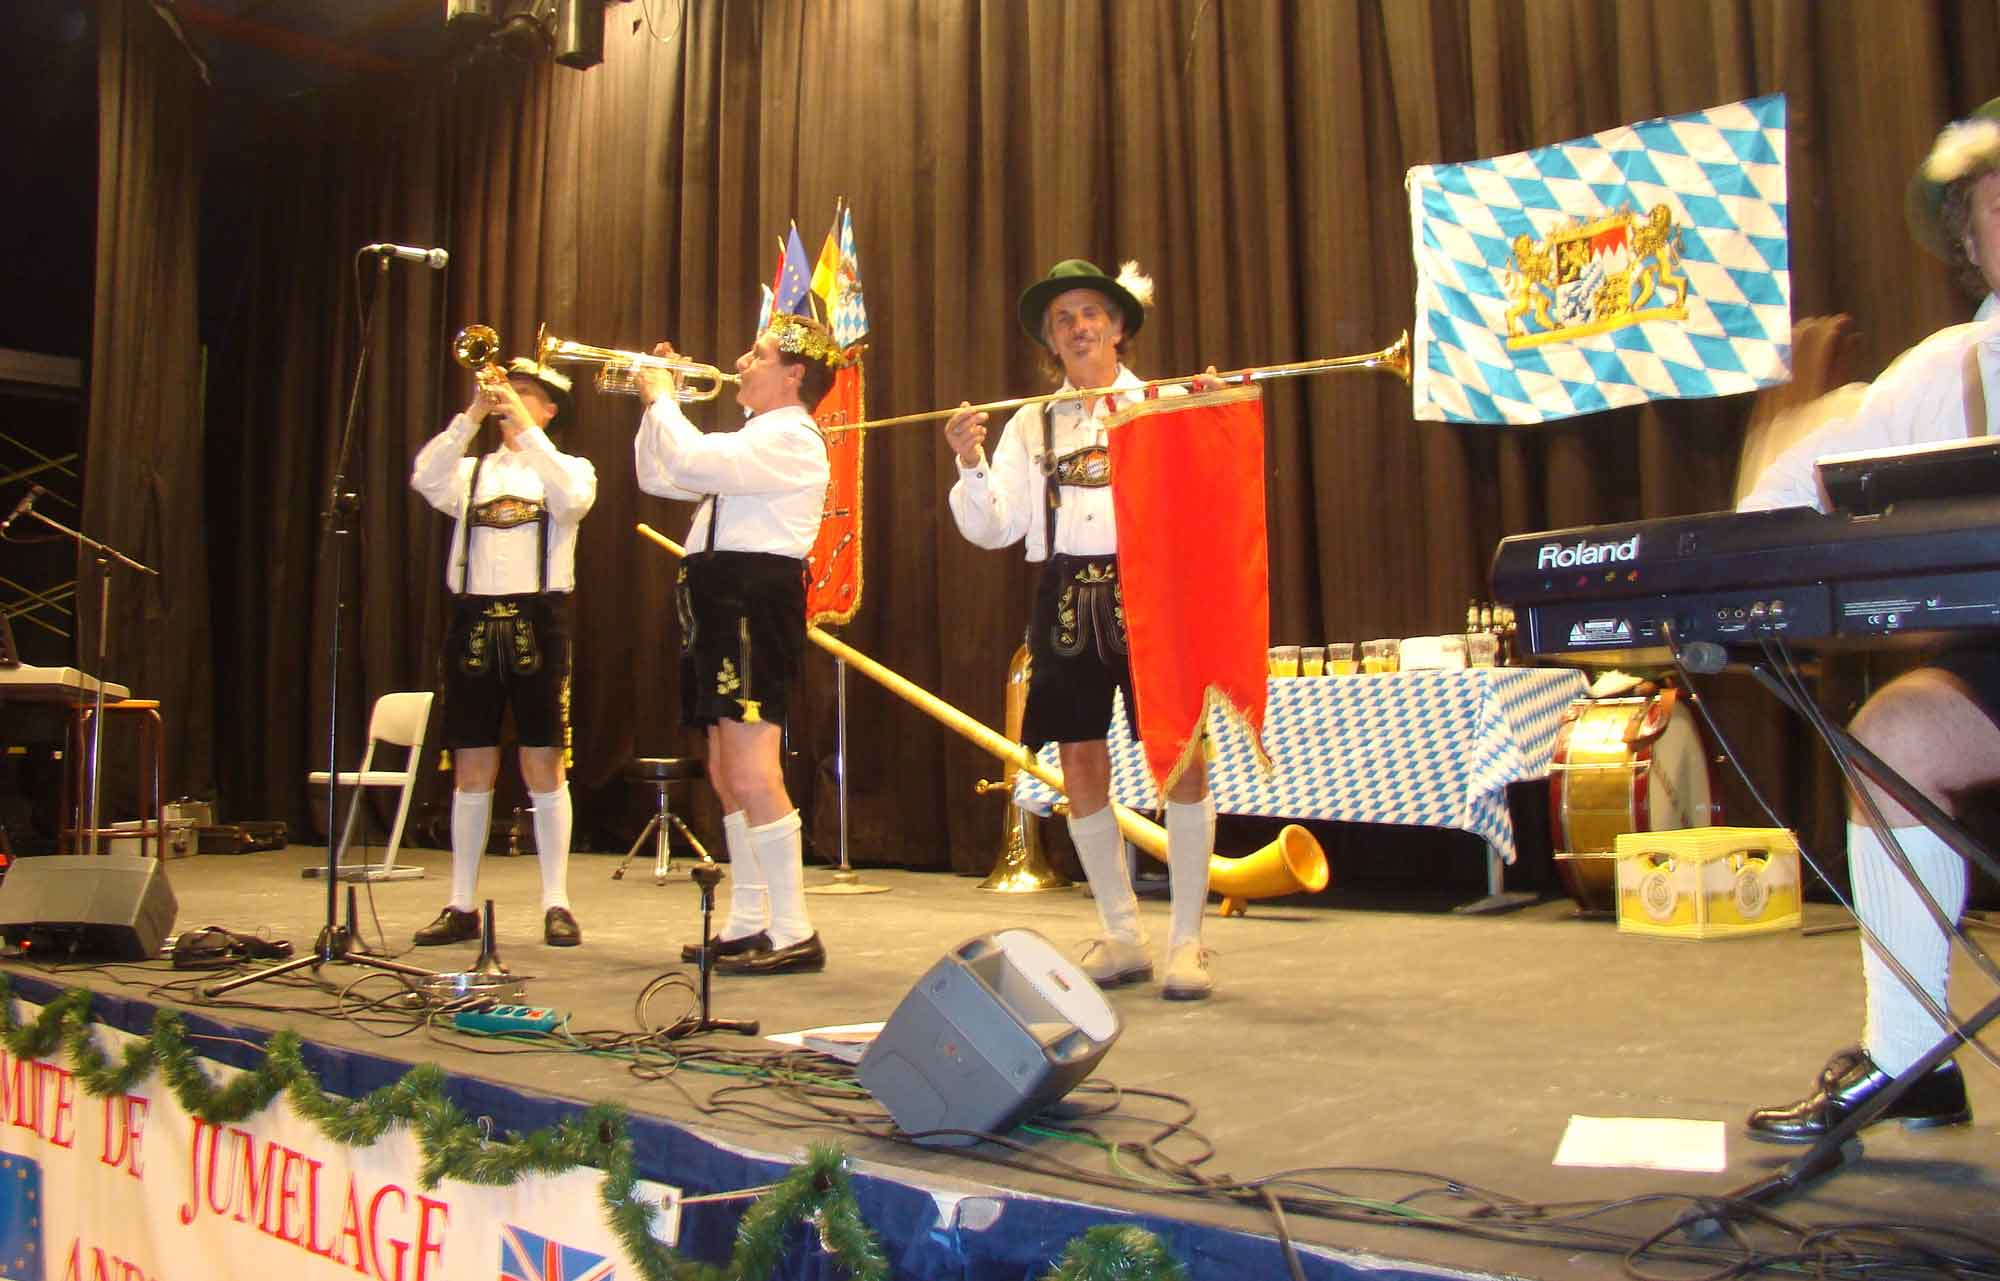 3 orchestre bavarois et de variété Gallisch Brezel, Andresy 78 2009